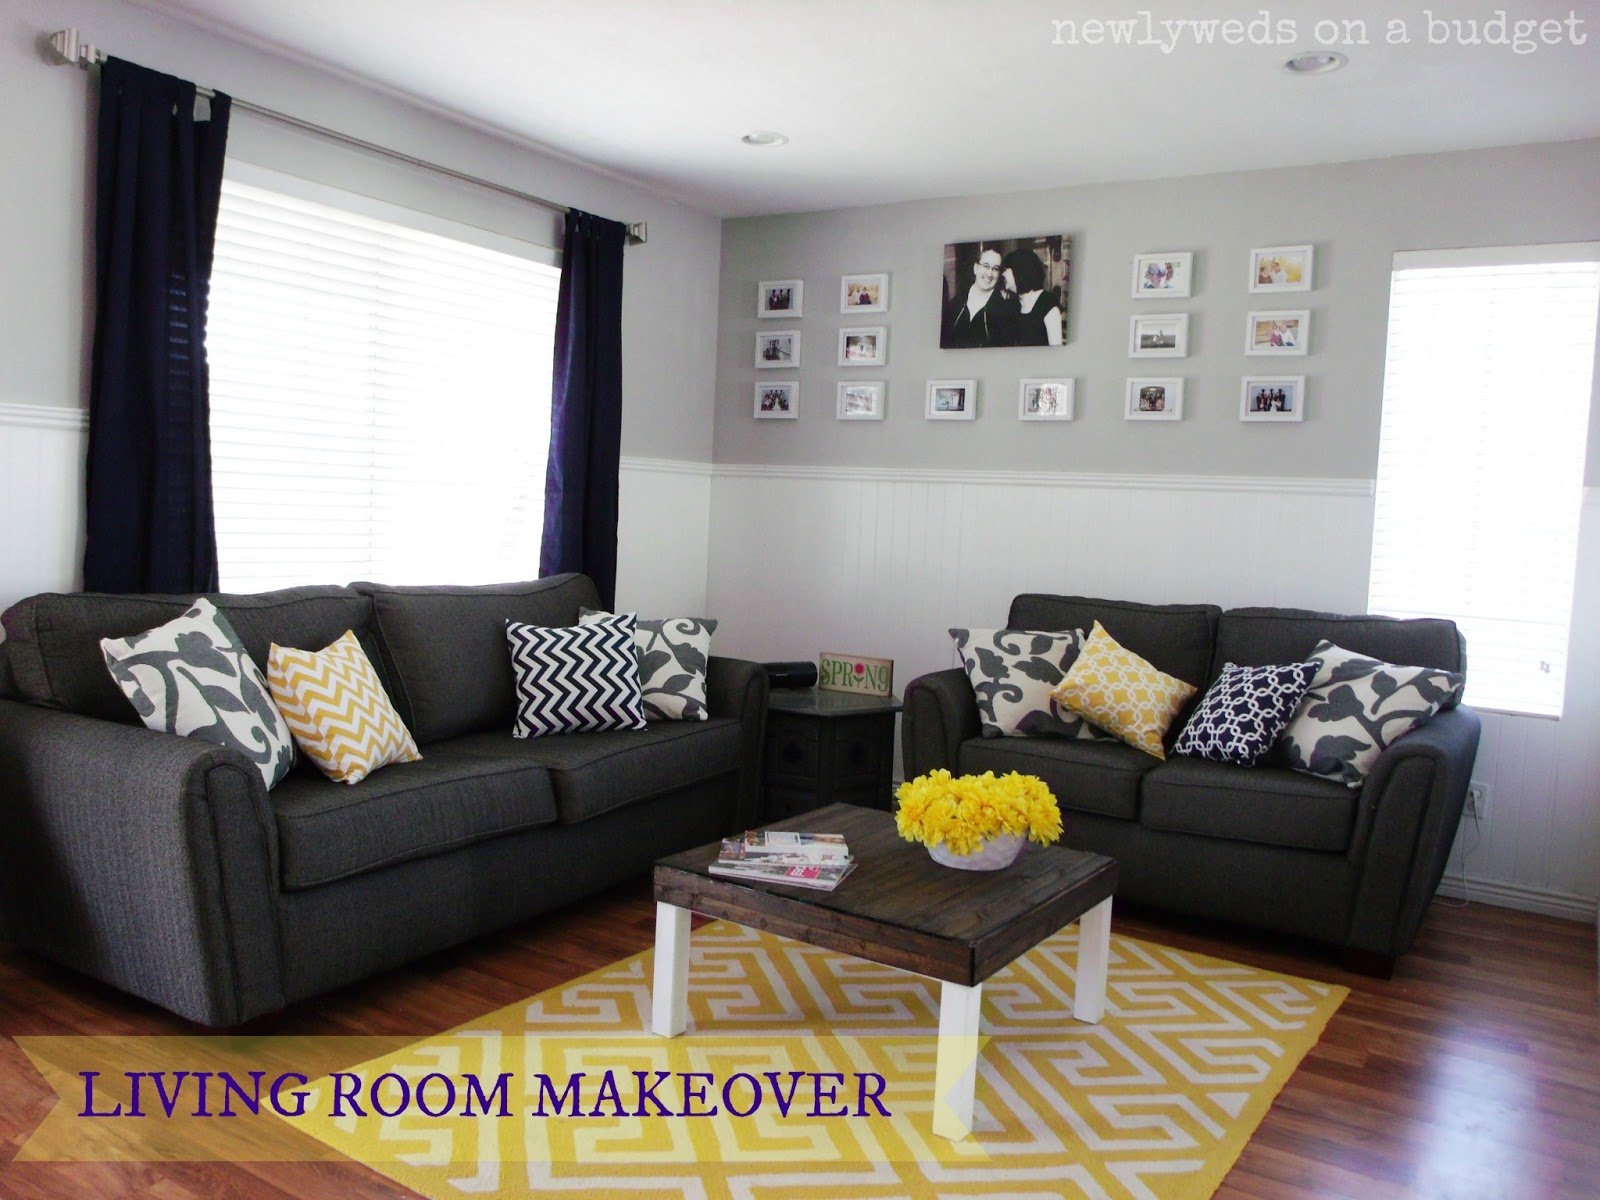 The Interior Decorating Rooms